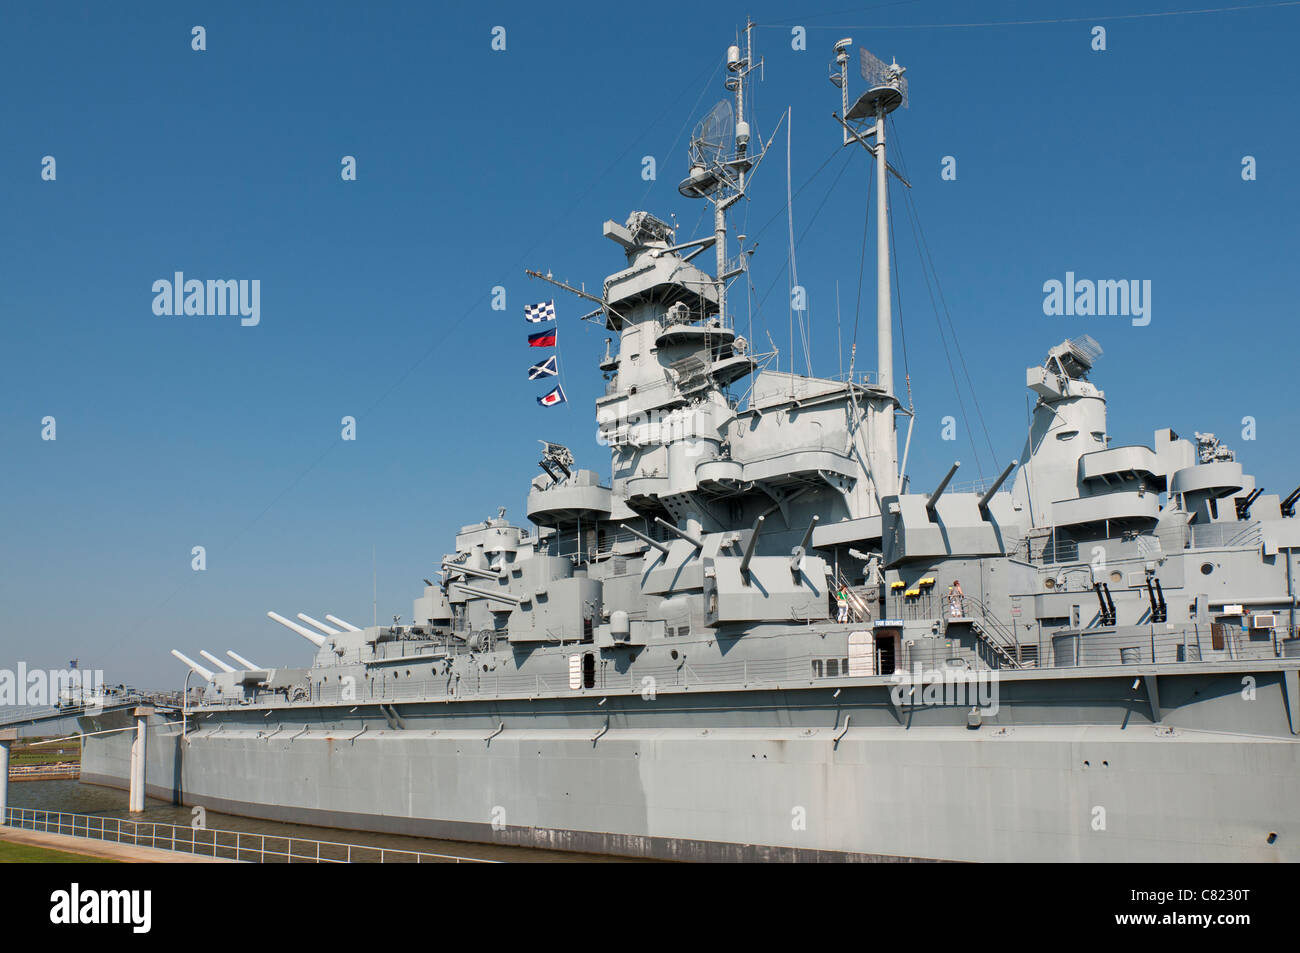 Alabama, Mobile, USS Alabama Battleship Memorial Park, in service 1943-47 -